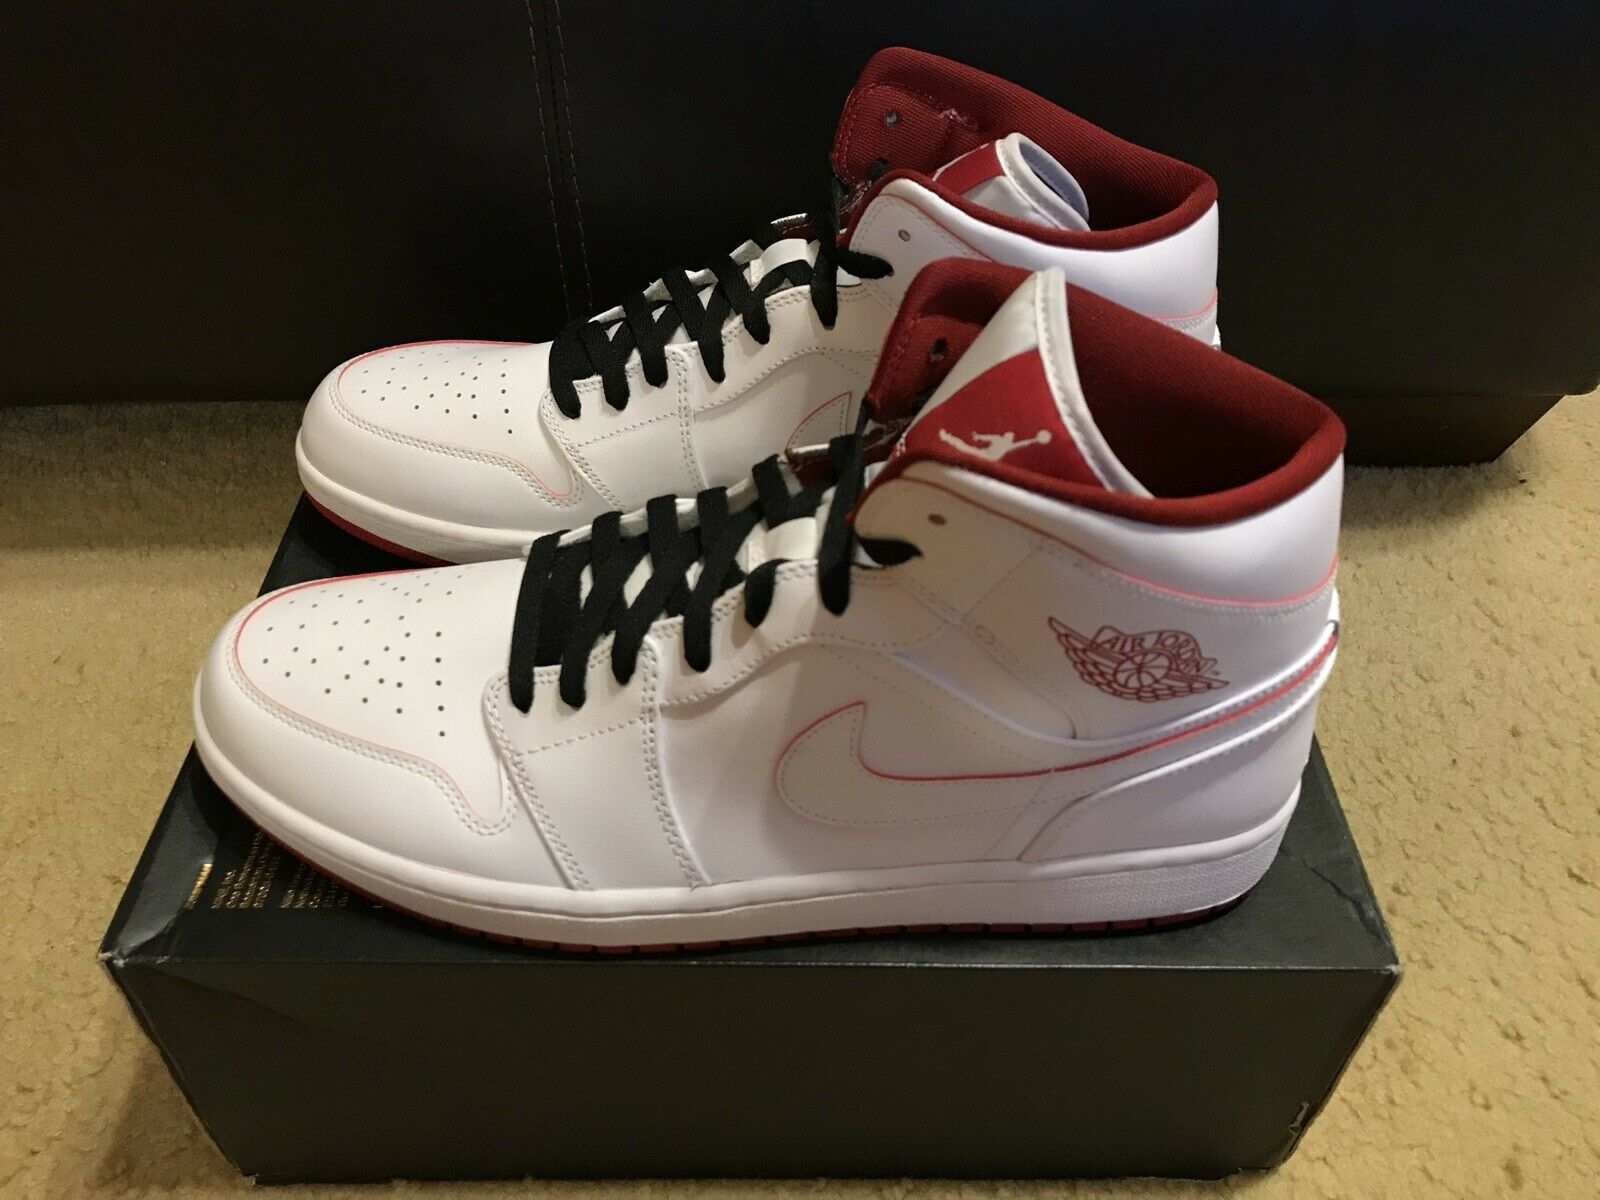 NIKE AIR JORDAN 1 MID Men's sz 13 White  Gym Red Sneakers 554724 103